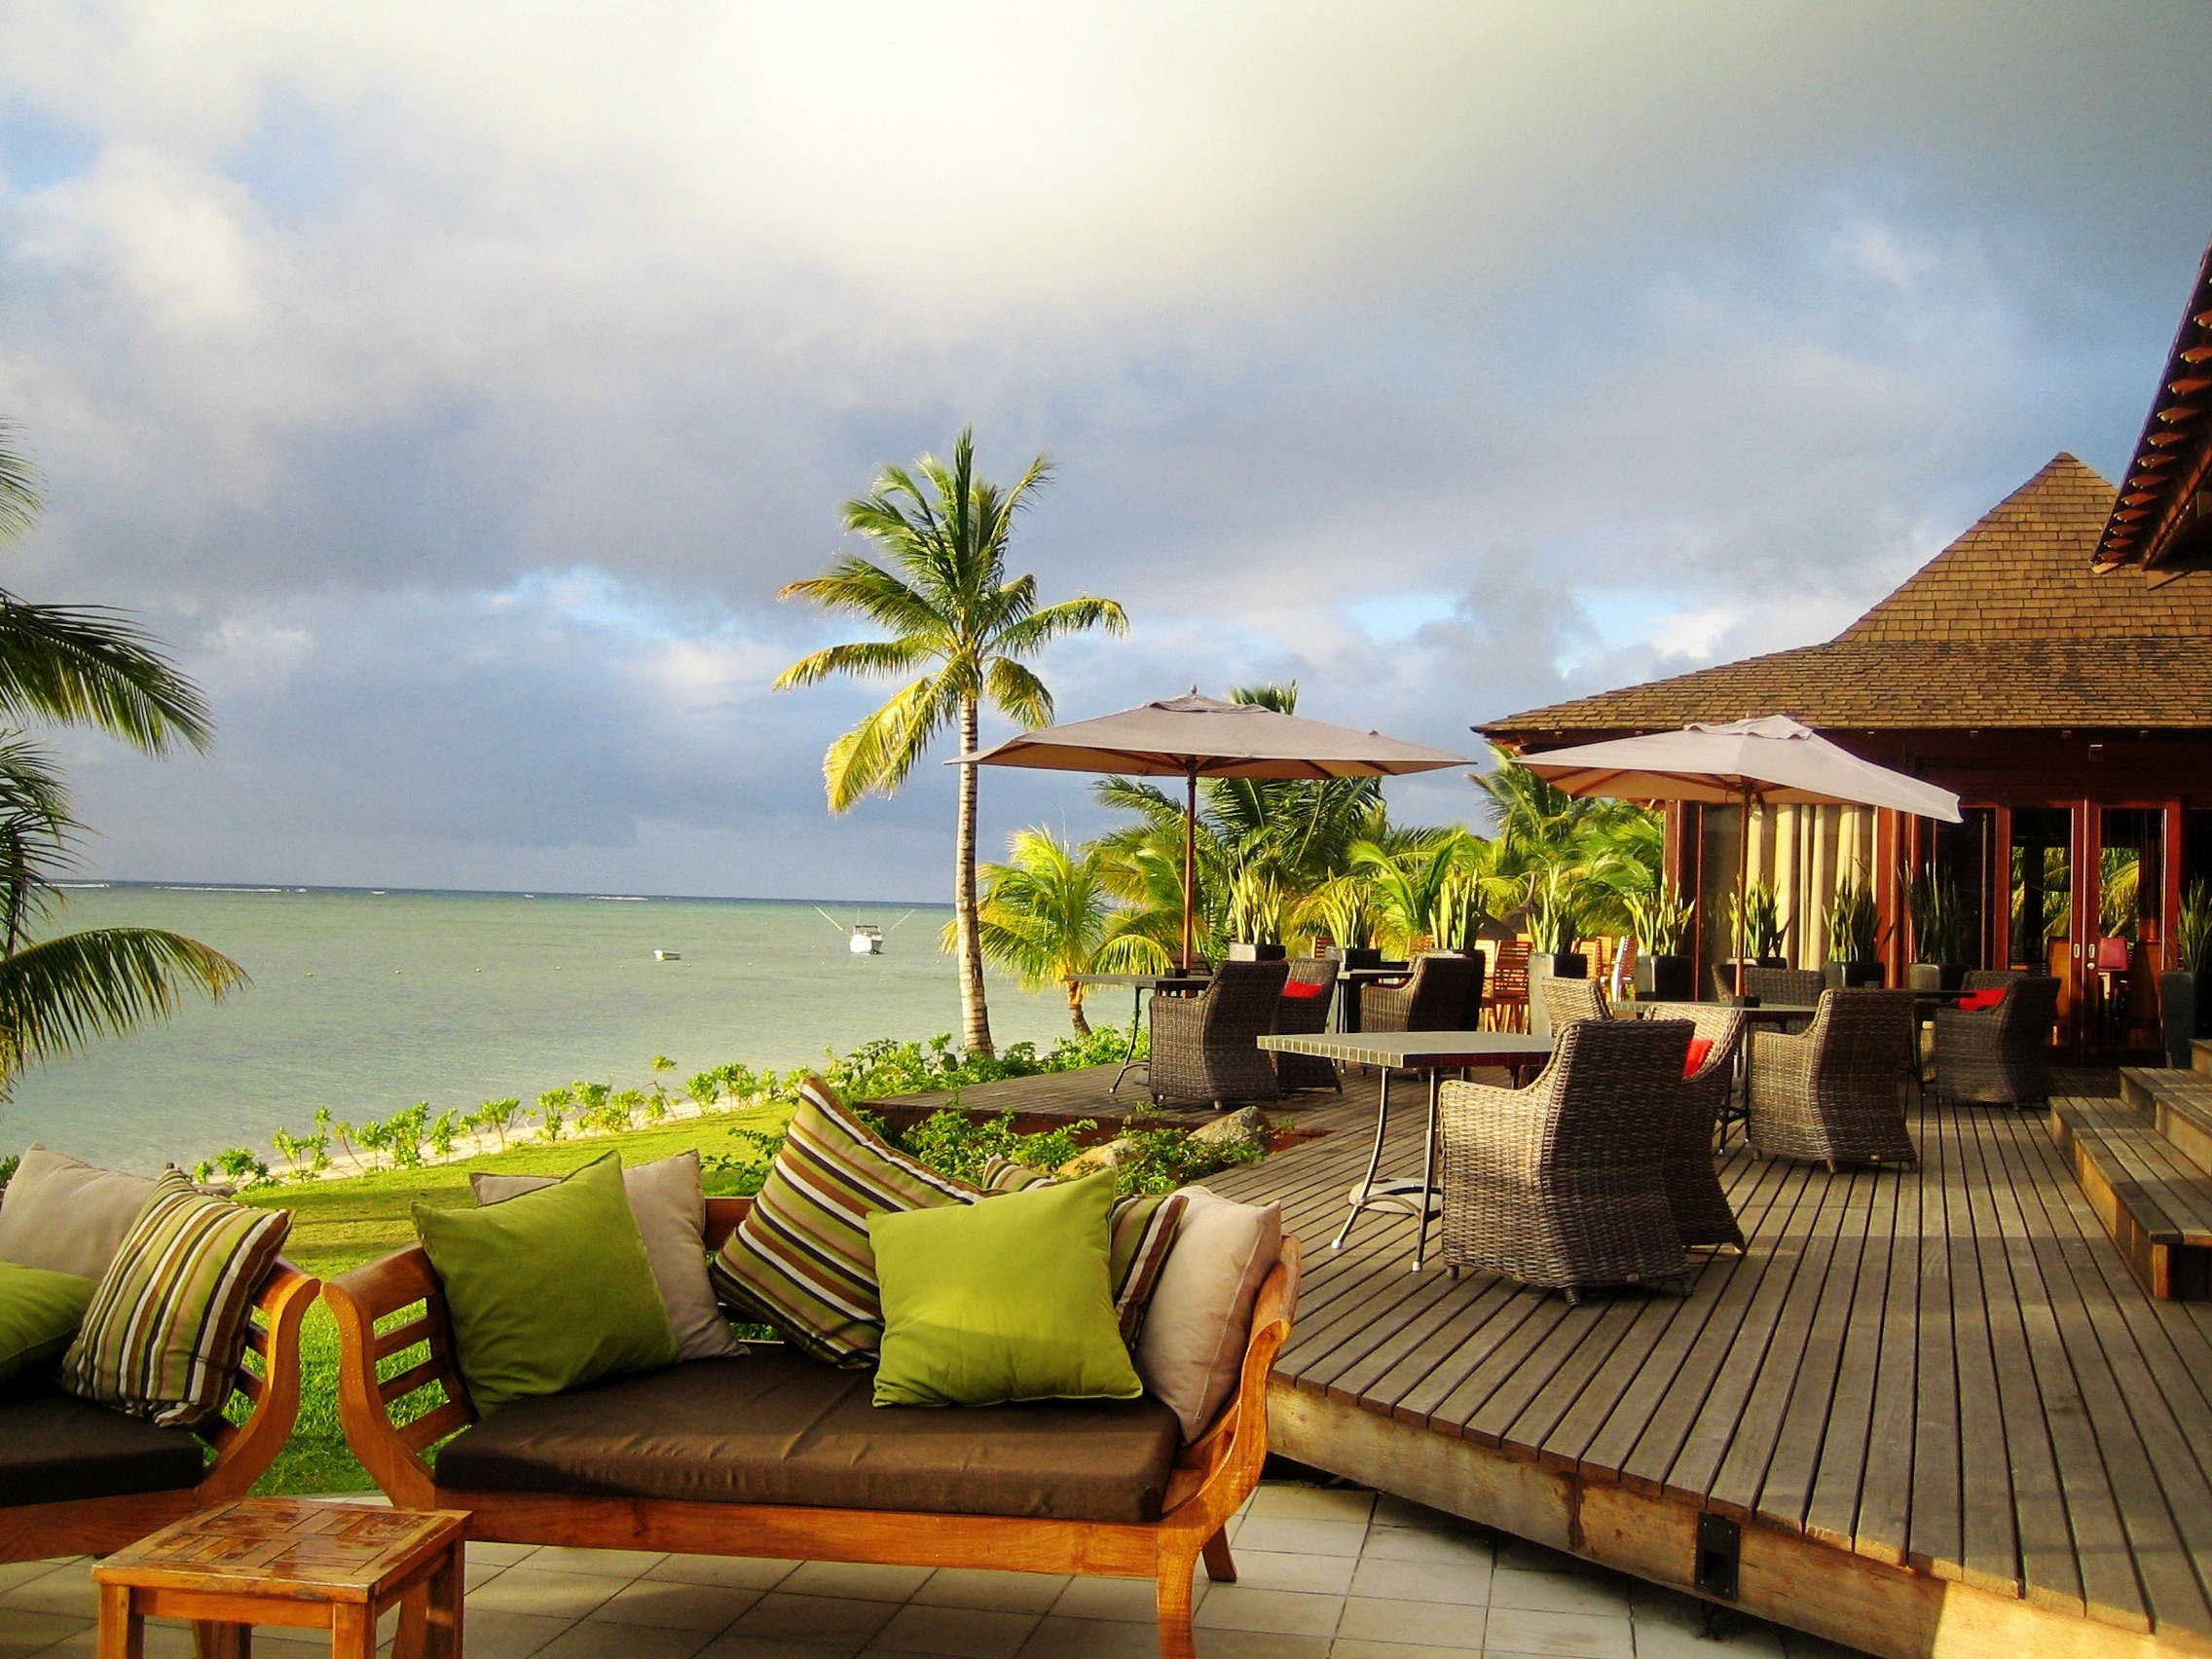 Tropical Island Beach Ambience Sound: Heritage Getaways » EXOTIC MAURITIUS (7 DAYS / 6 NIGHTS